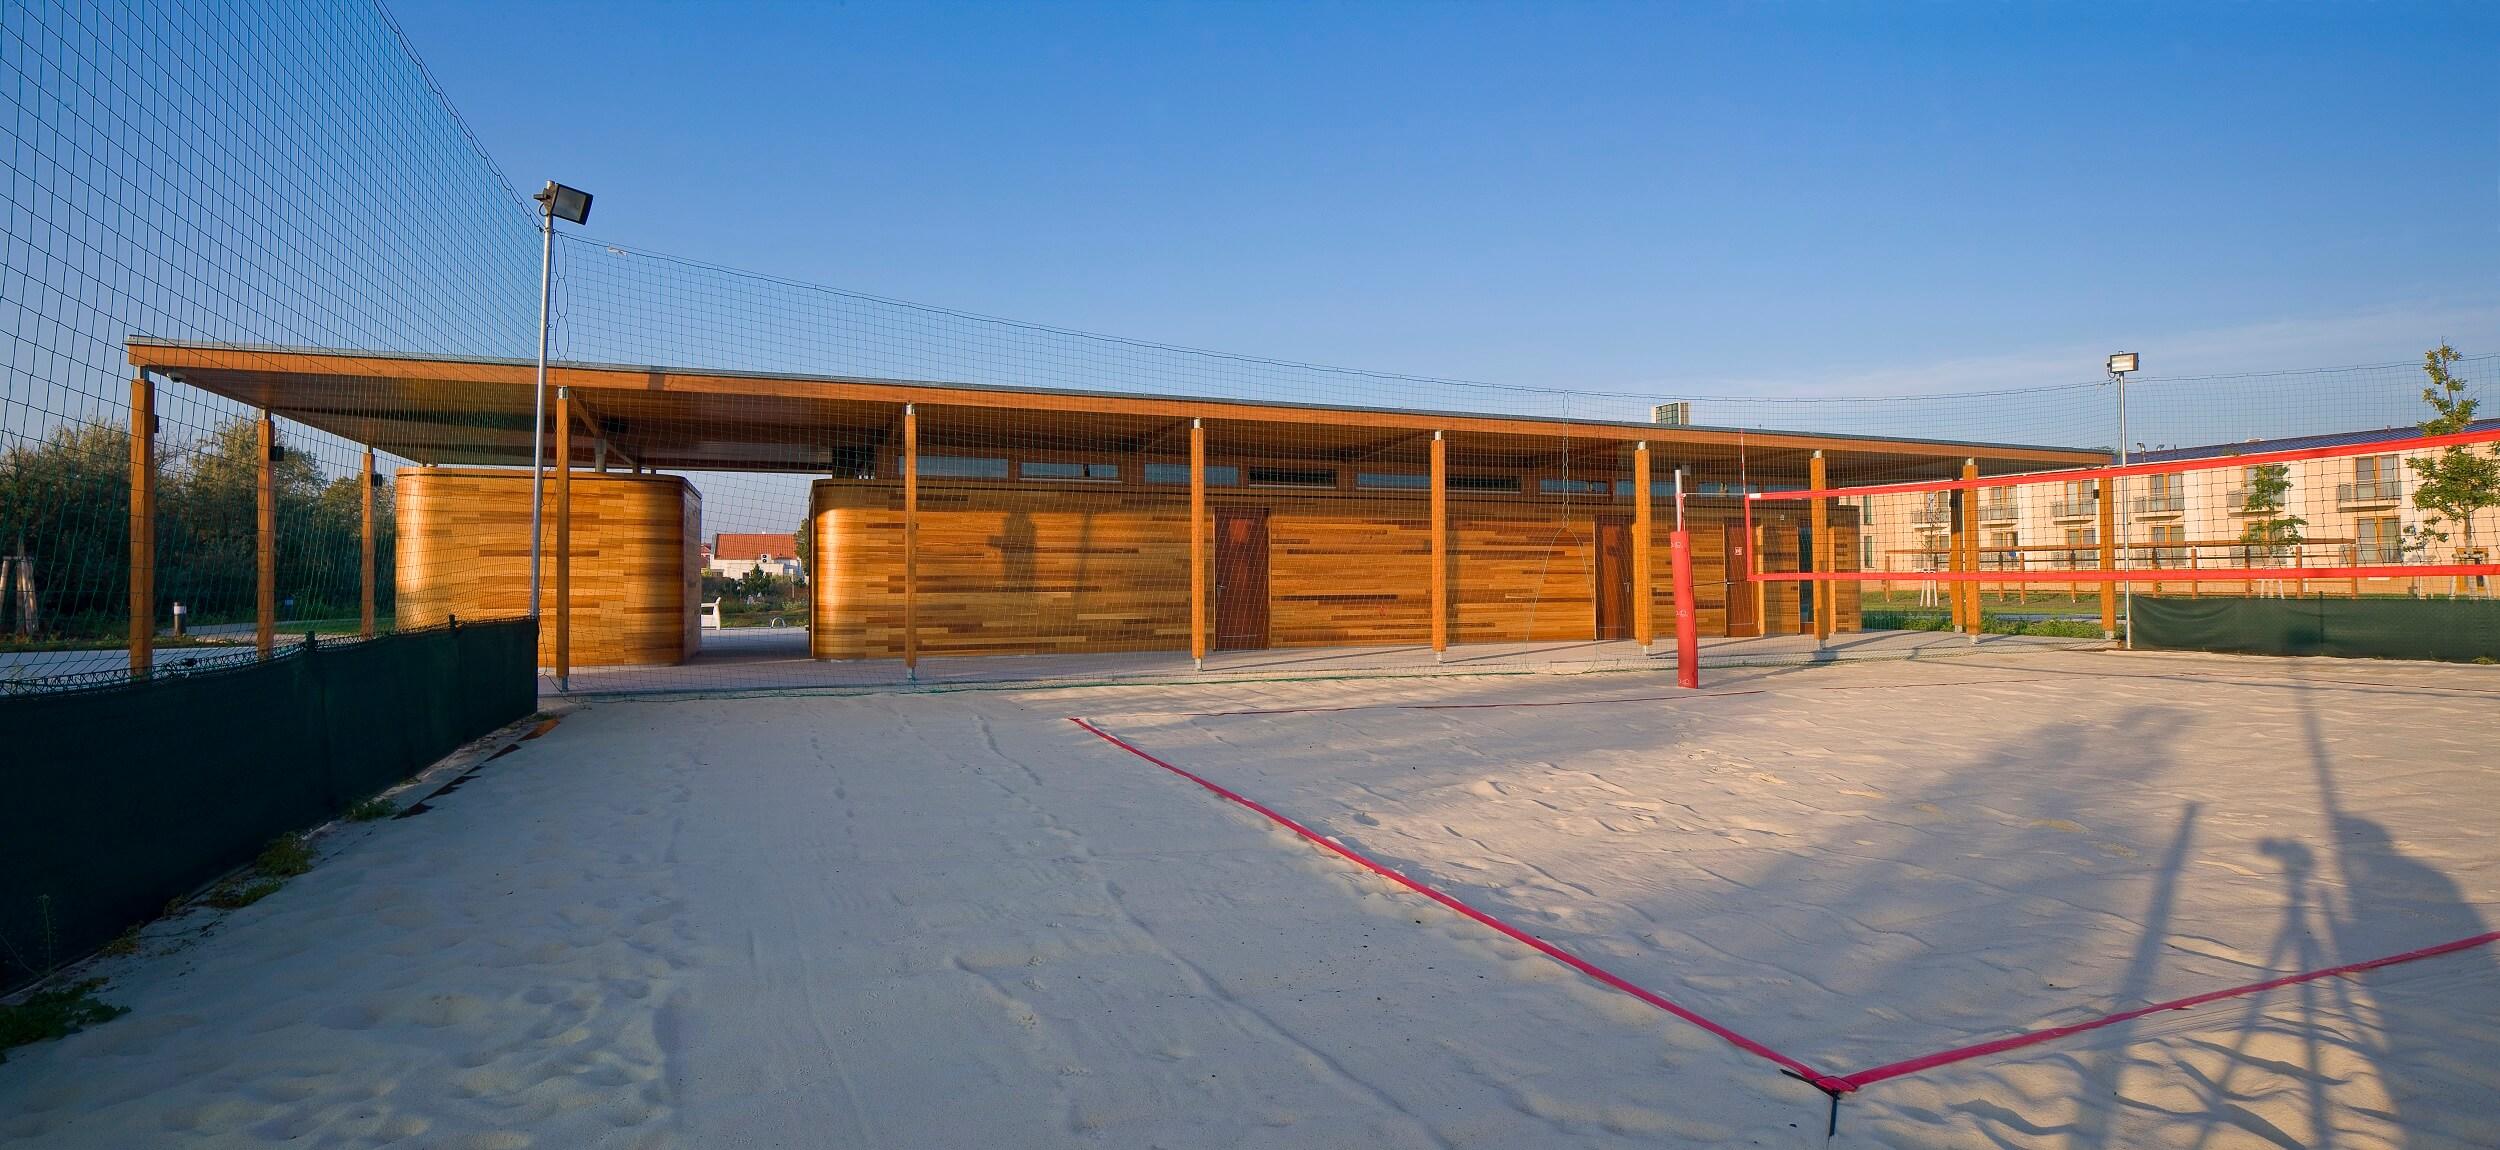 Atelier Habina Obslužná budova